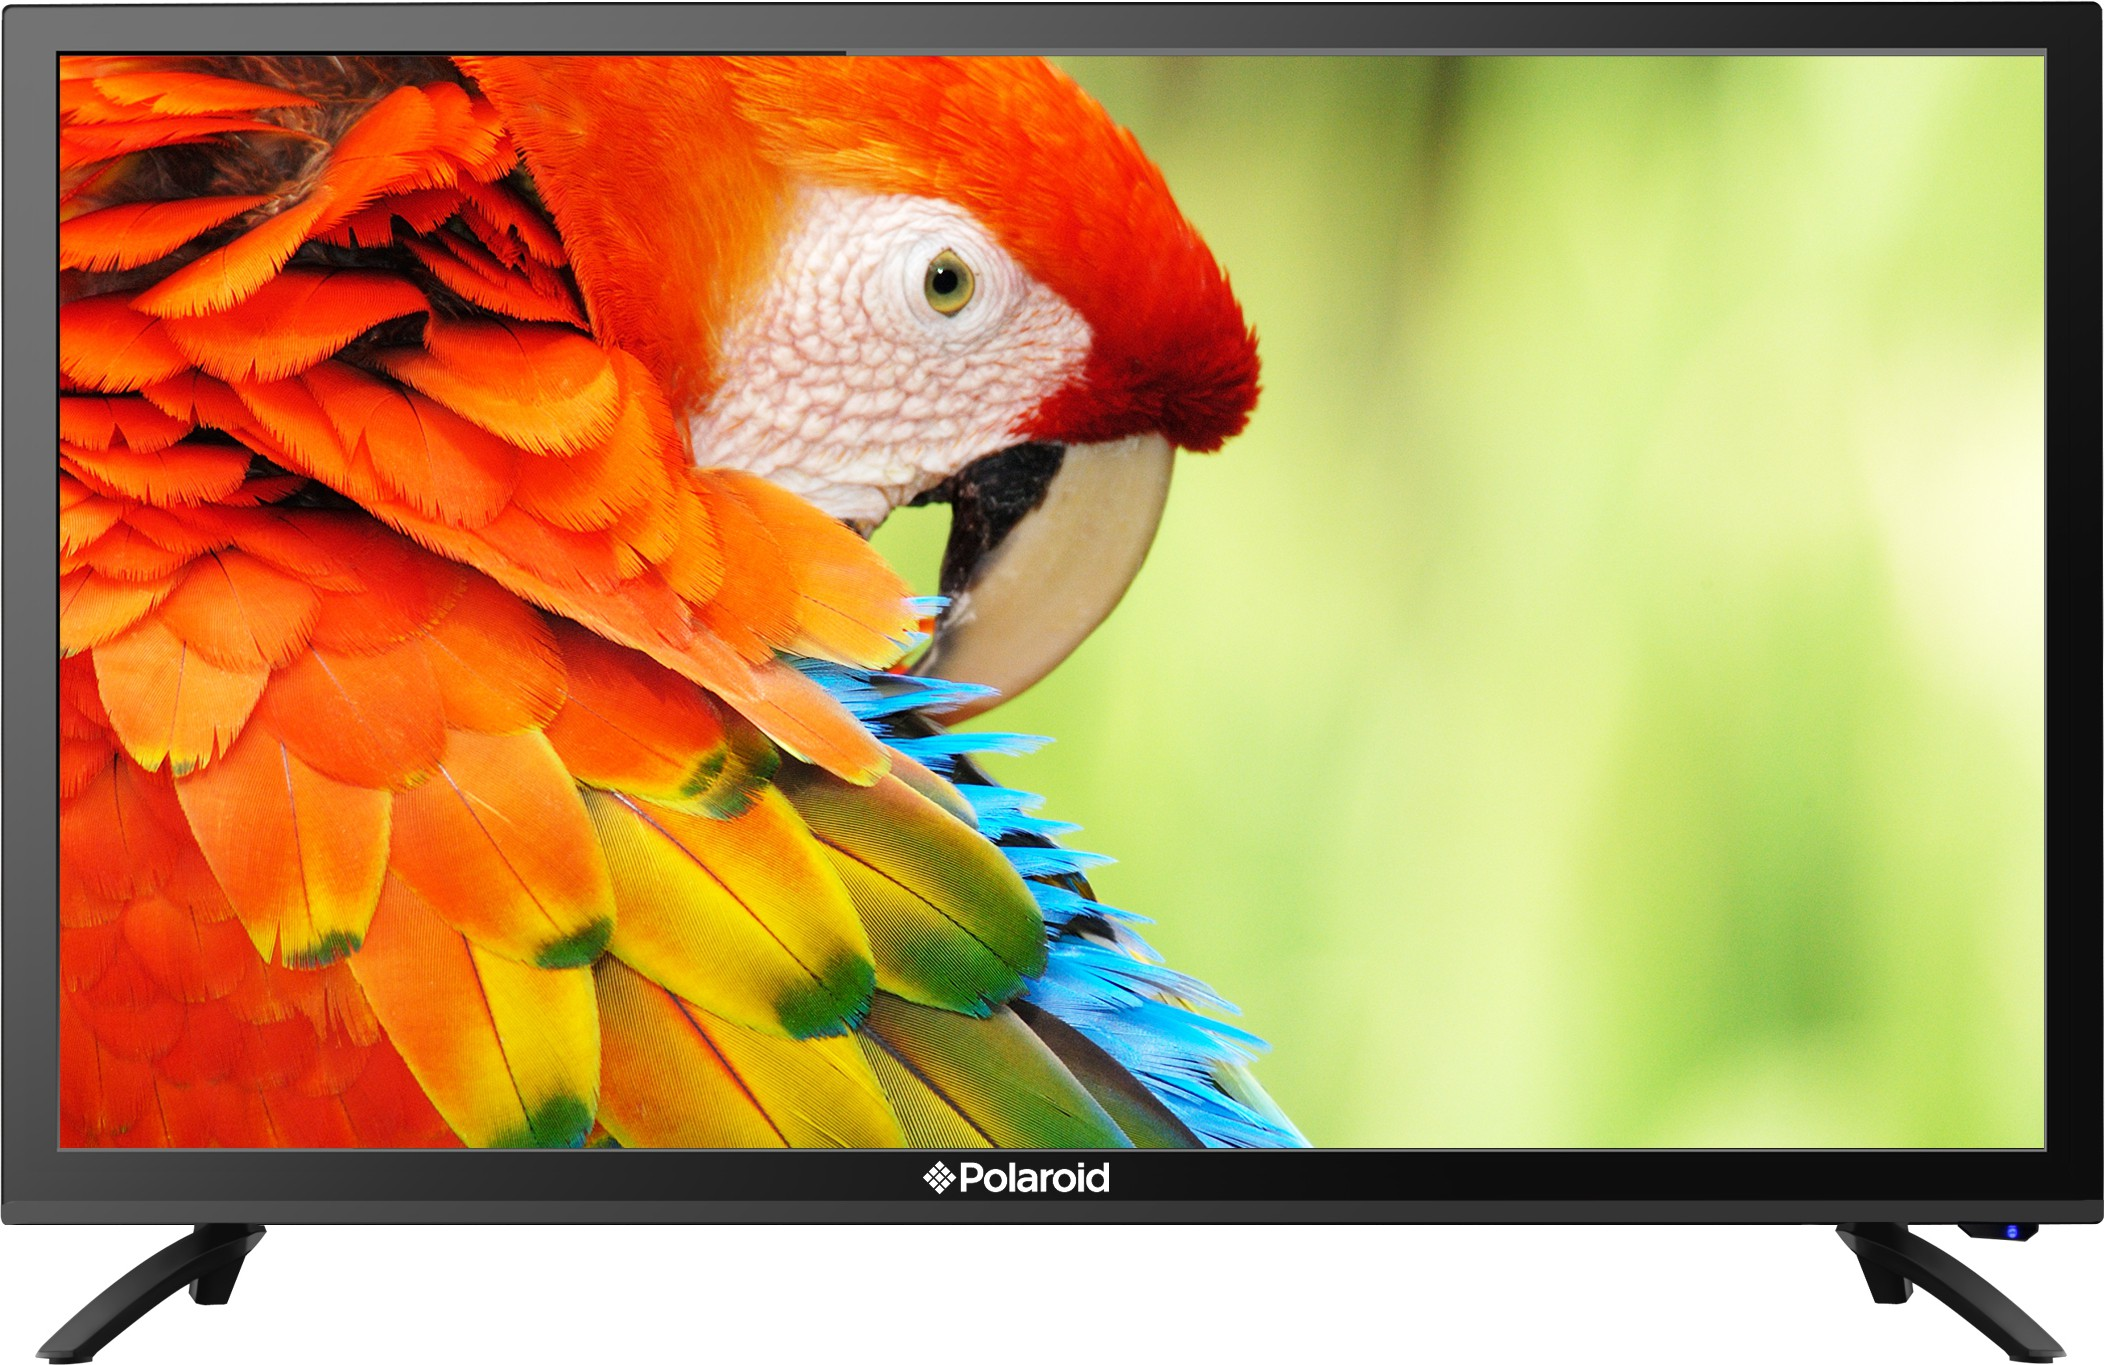 POLAROID 32HDRS100 32 Inches HD Ready LED TV